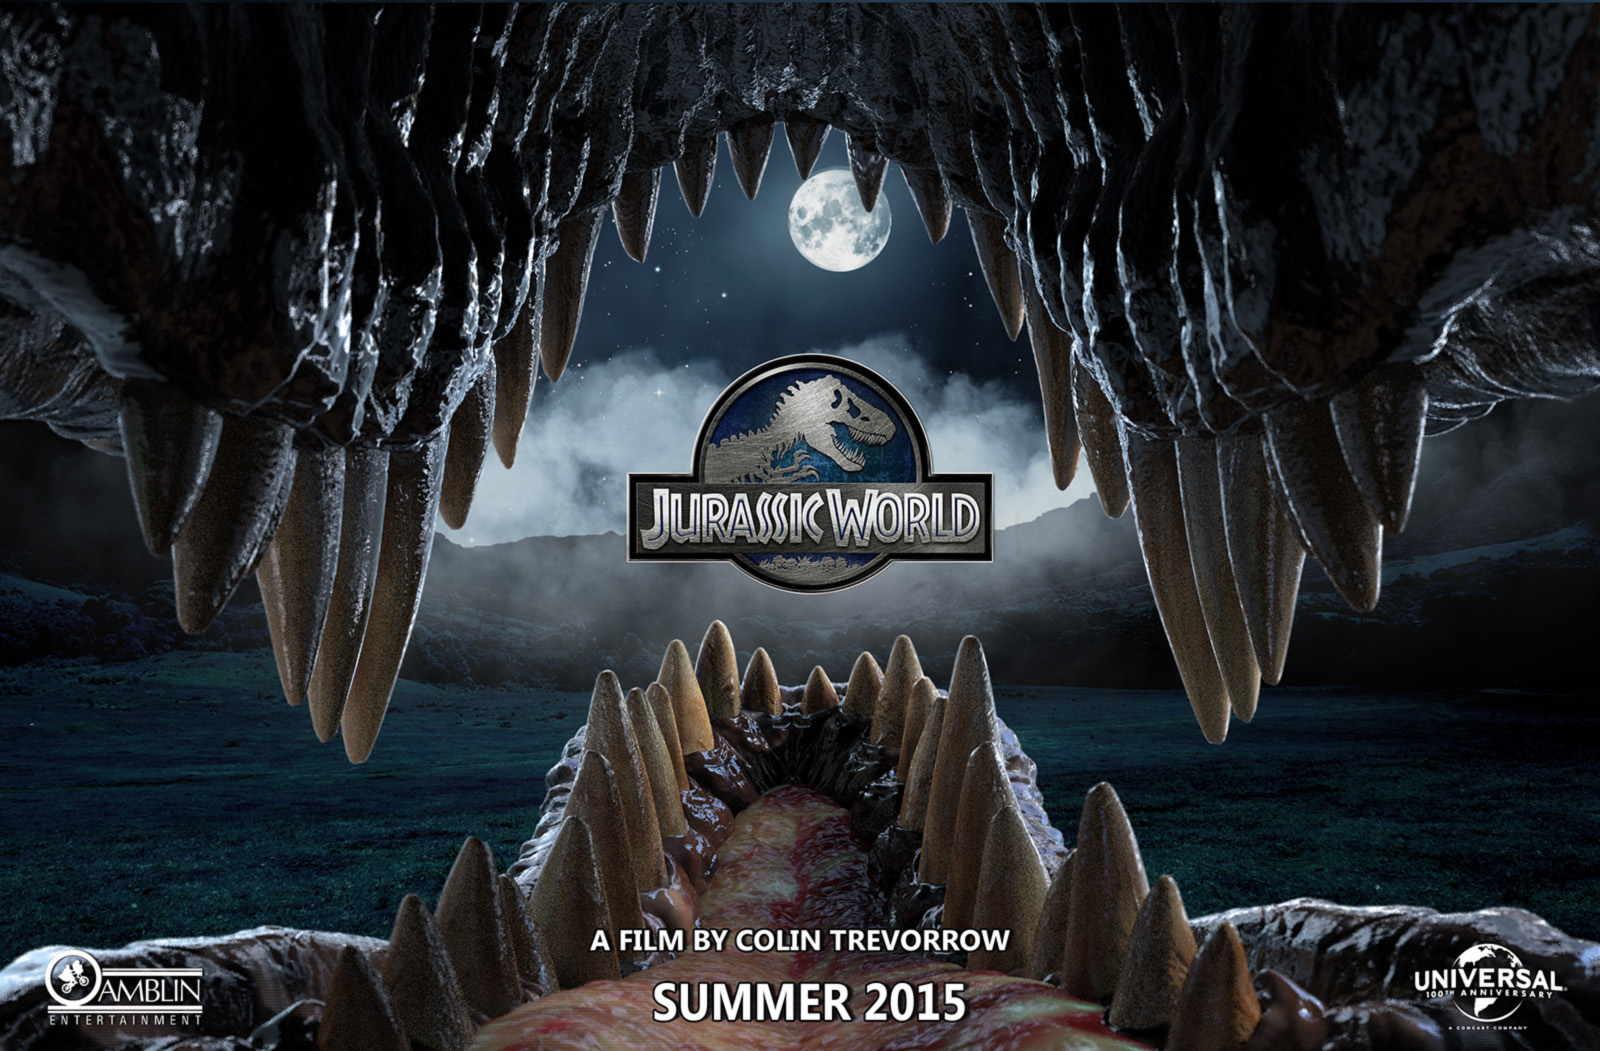 Jurassic-World-logo1